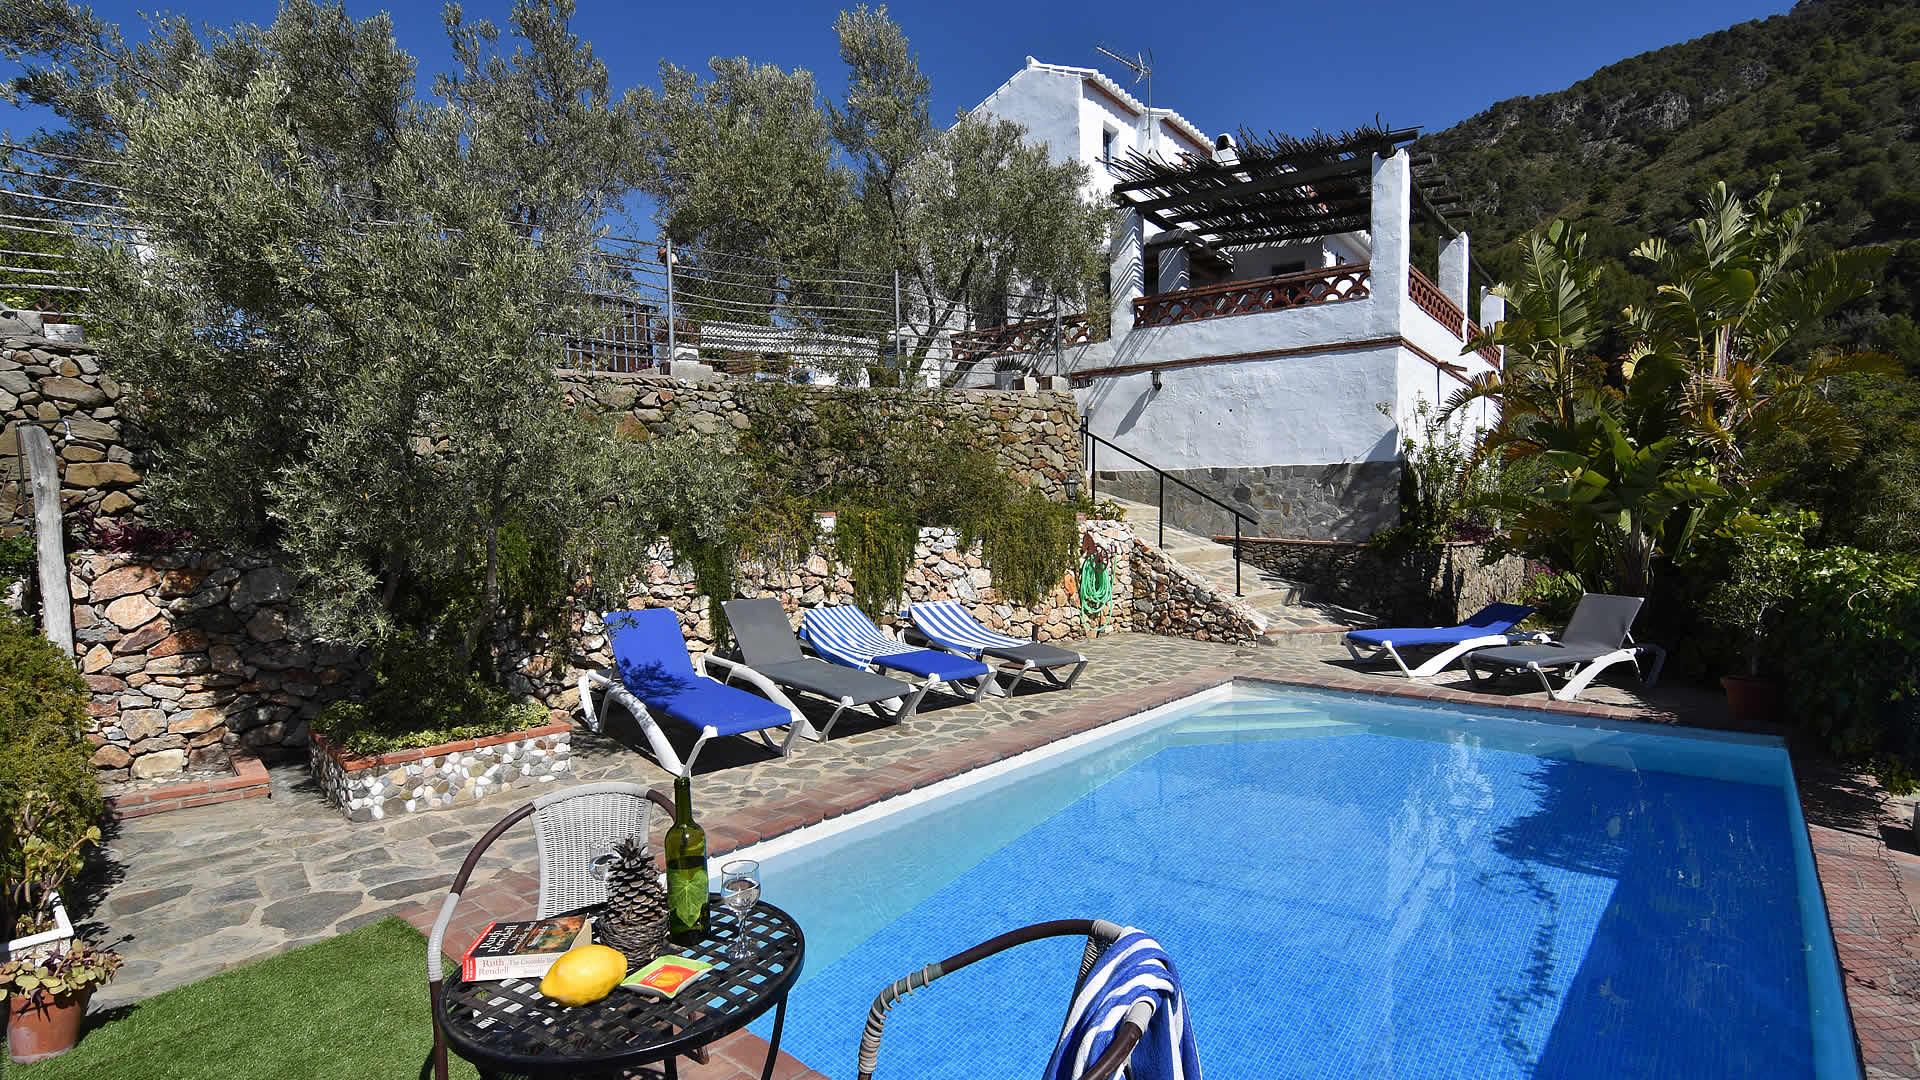 Ferienhaus mit Privatpool für 6 Personen in Frigiliana Andalusien Costa del Sol